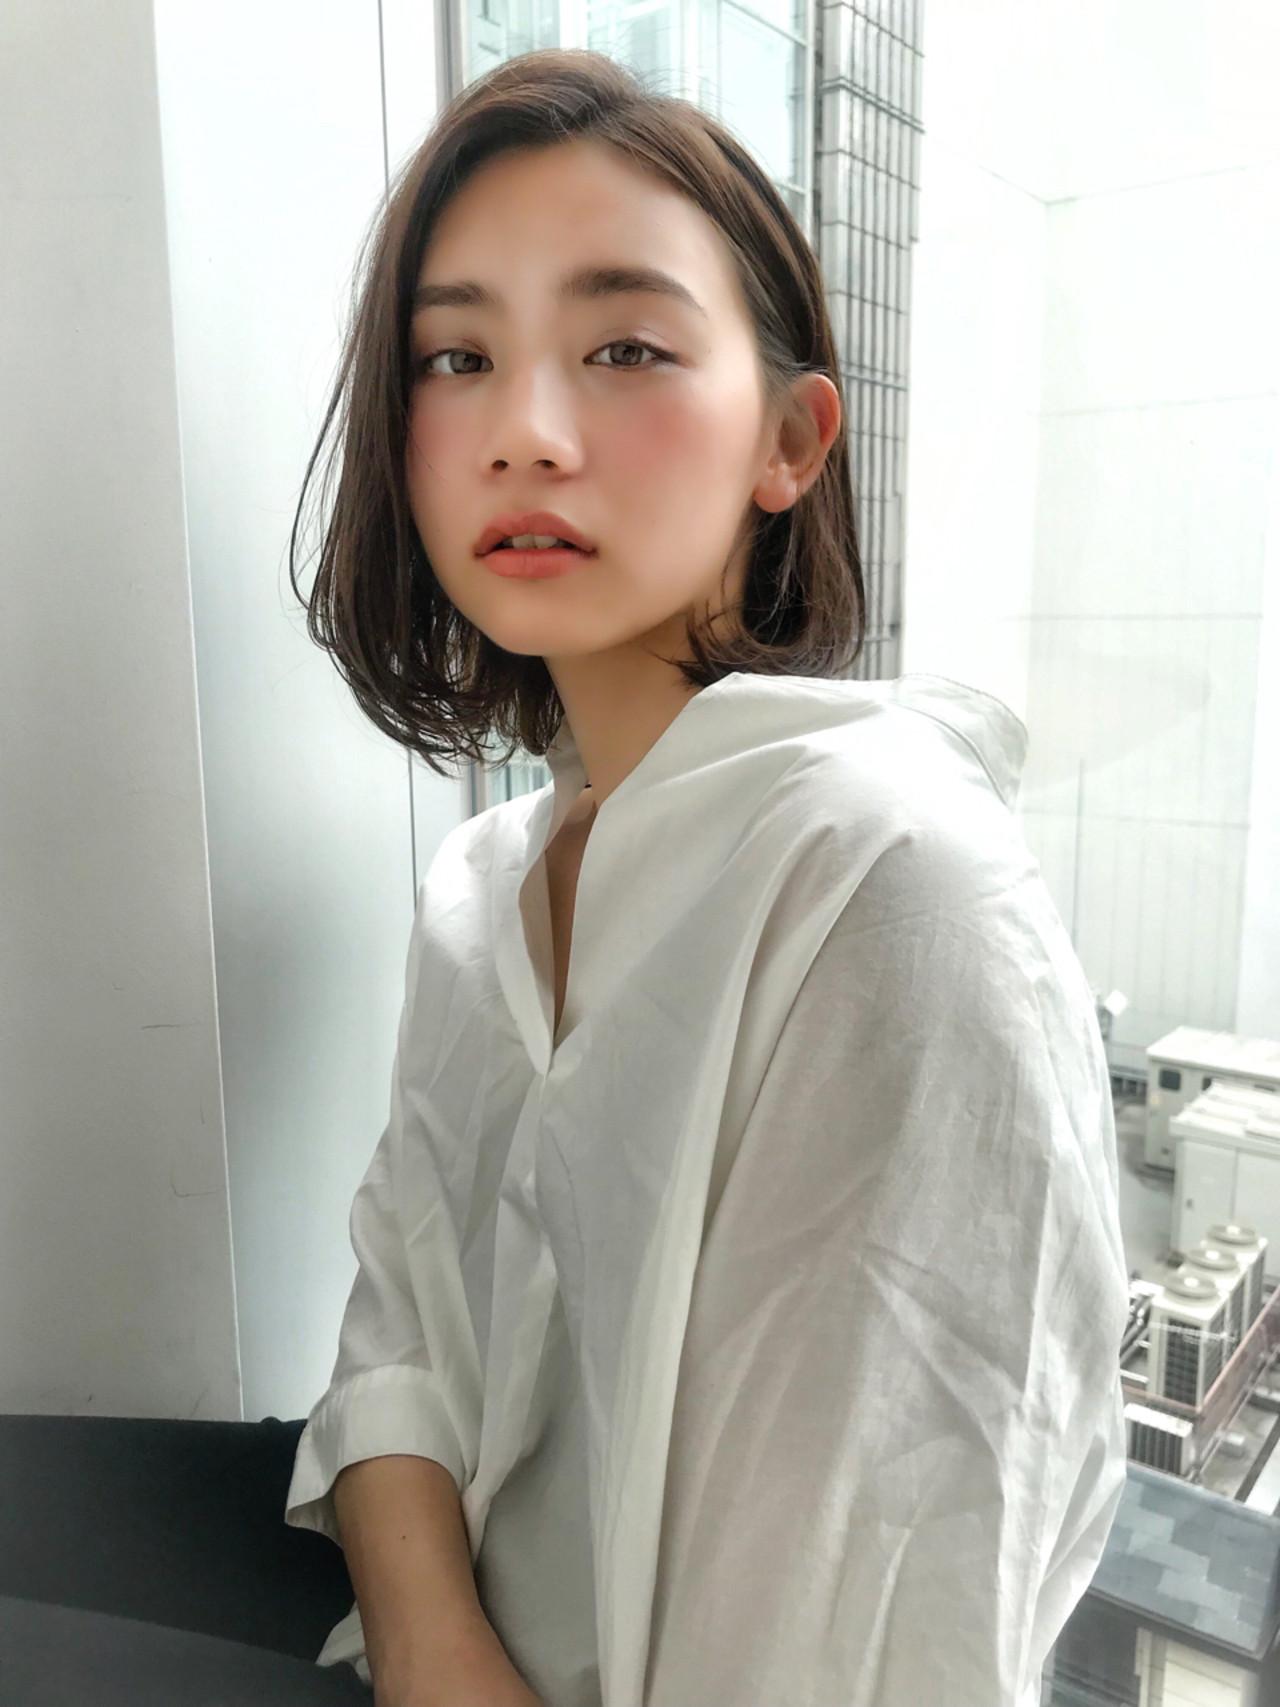 BBQ ナチュラル オフィス ヘアアレンジ ヘアスタイルや髪型の写真・画像 | MANOHARU 新屋敷 / MANOHARU